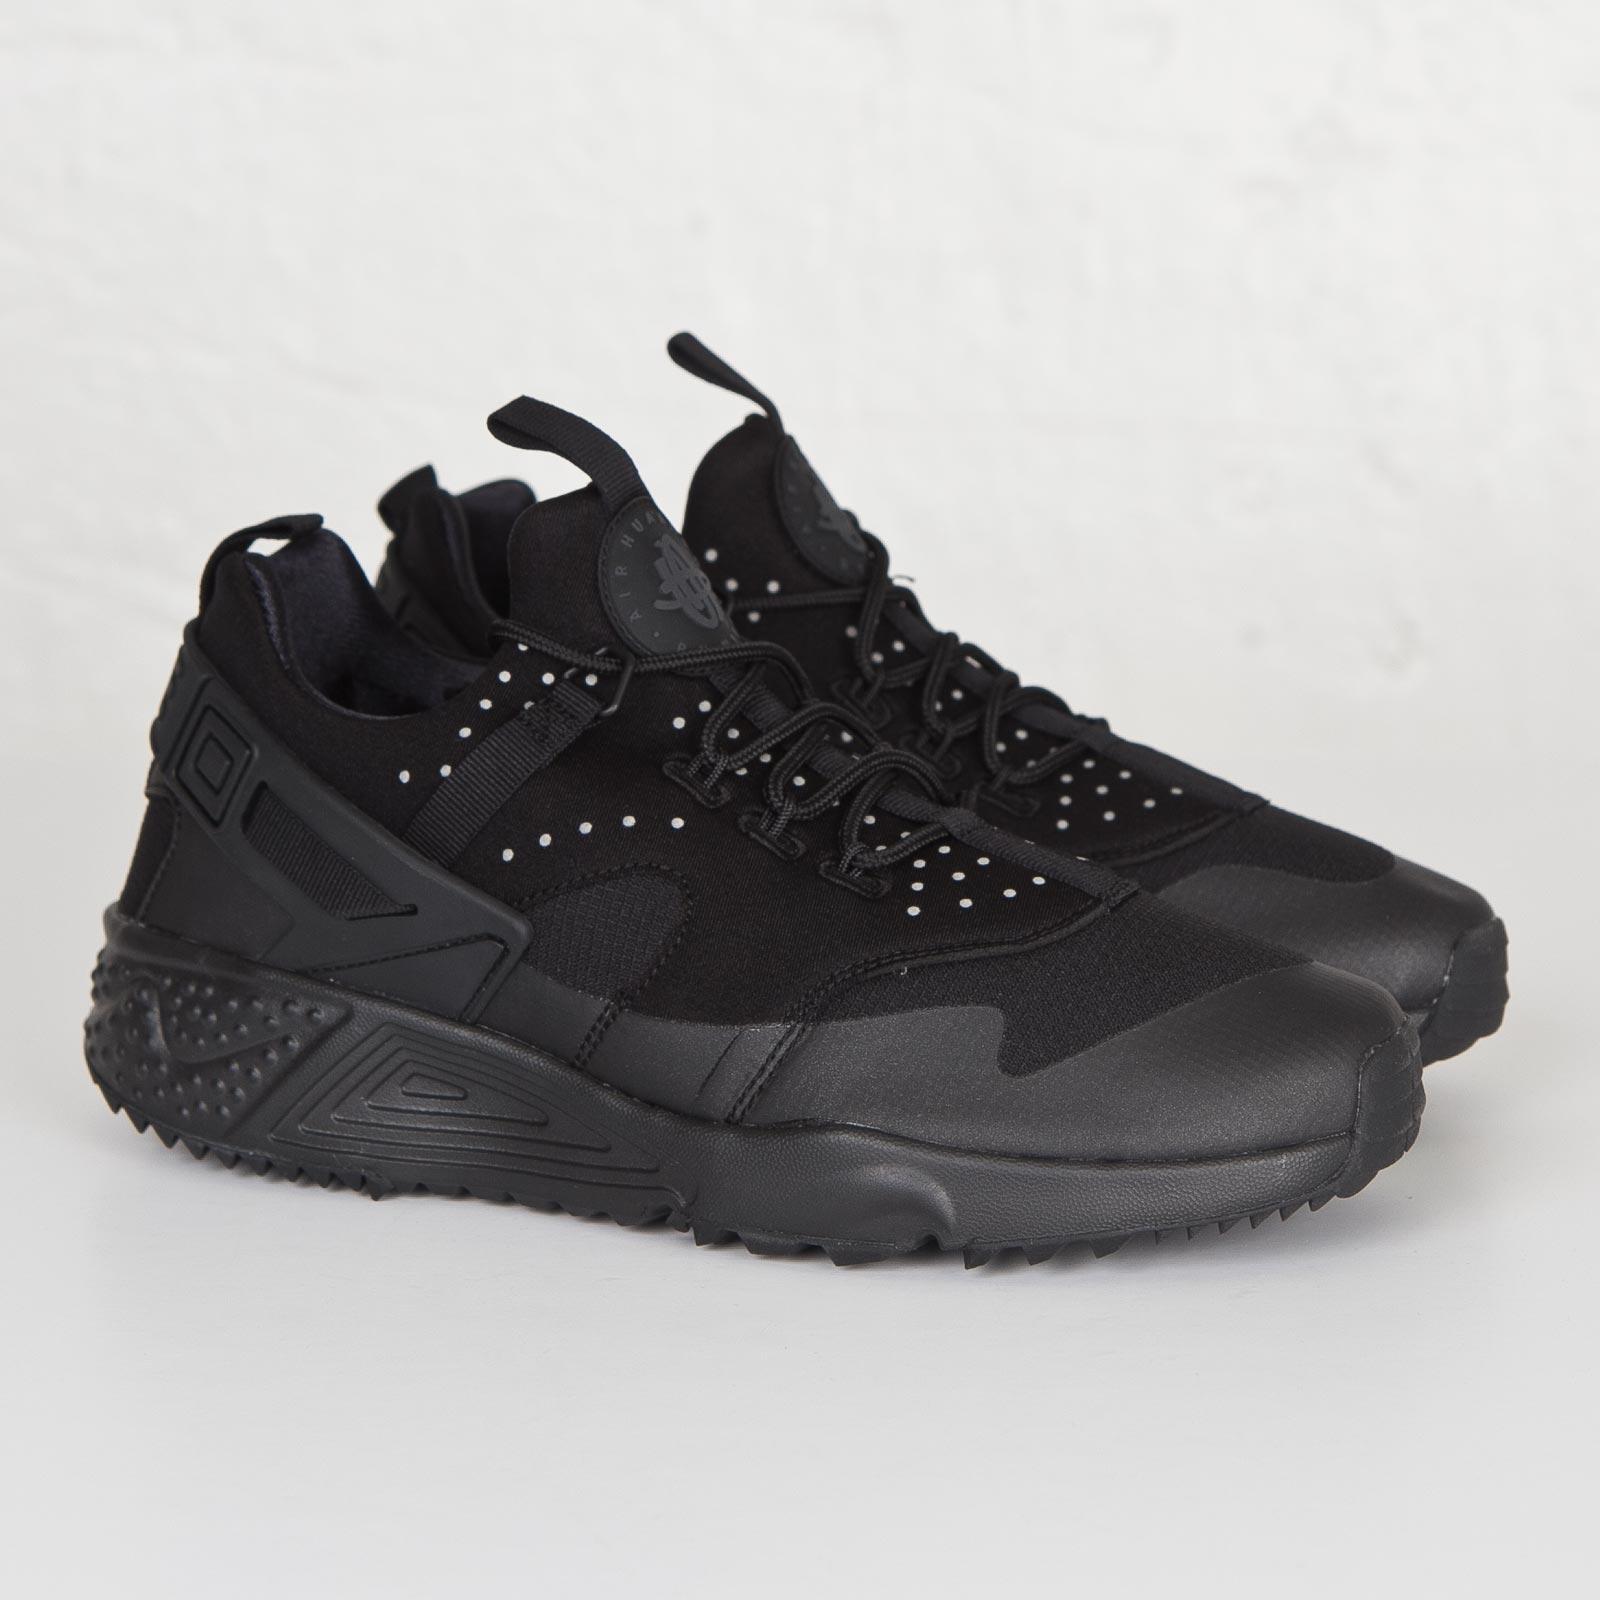 4d2d58635728 Nike Air Huarache Utility - 806807-002 - Sneakersnstuff